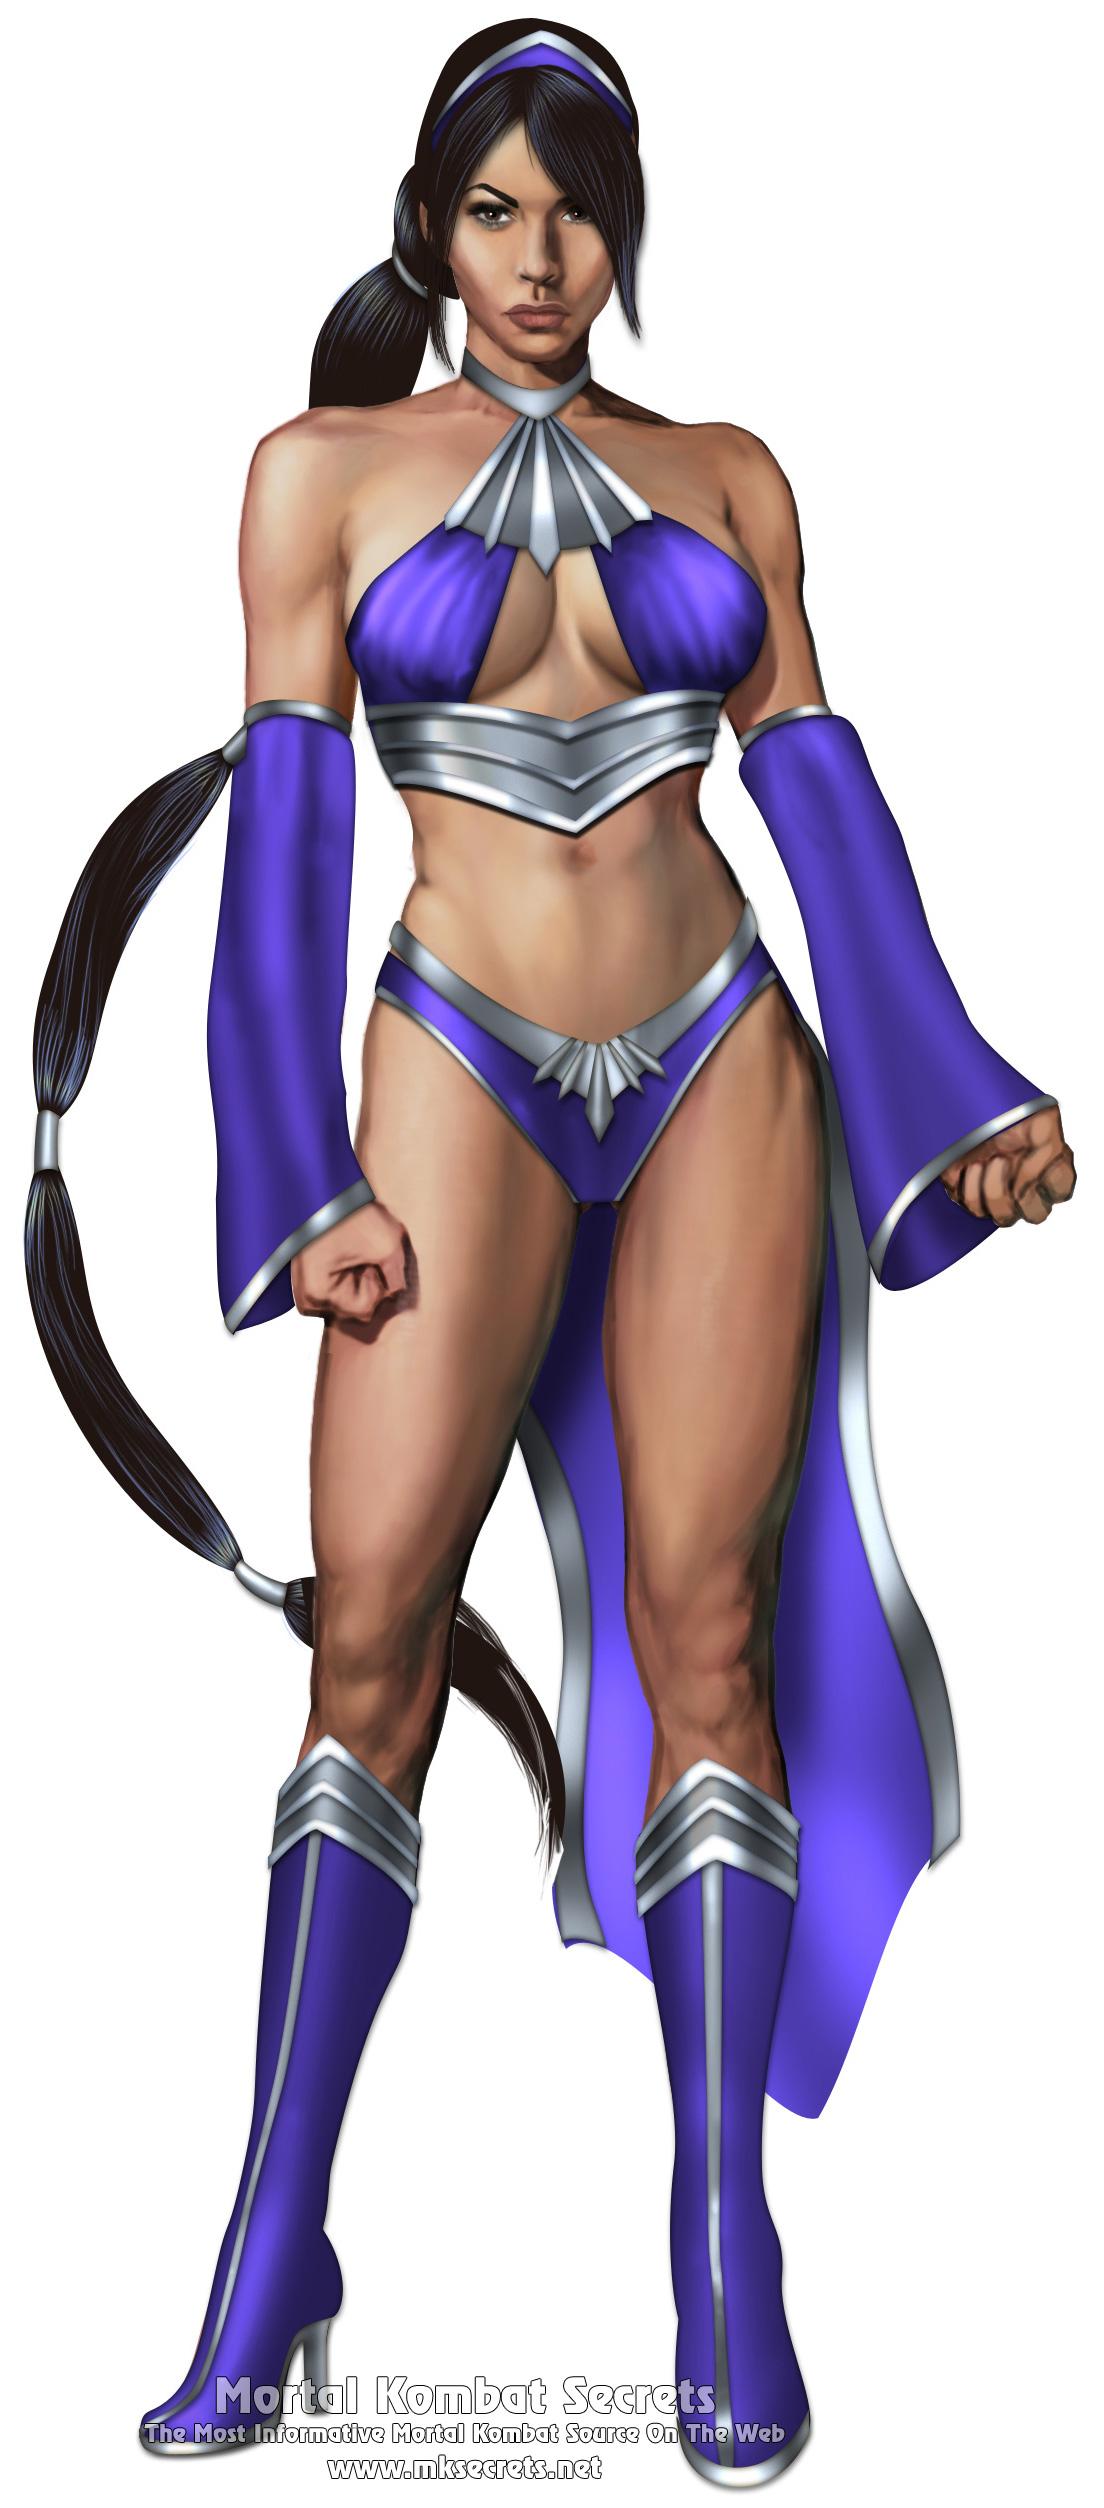 Mortal kombat female characters sexy photos